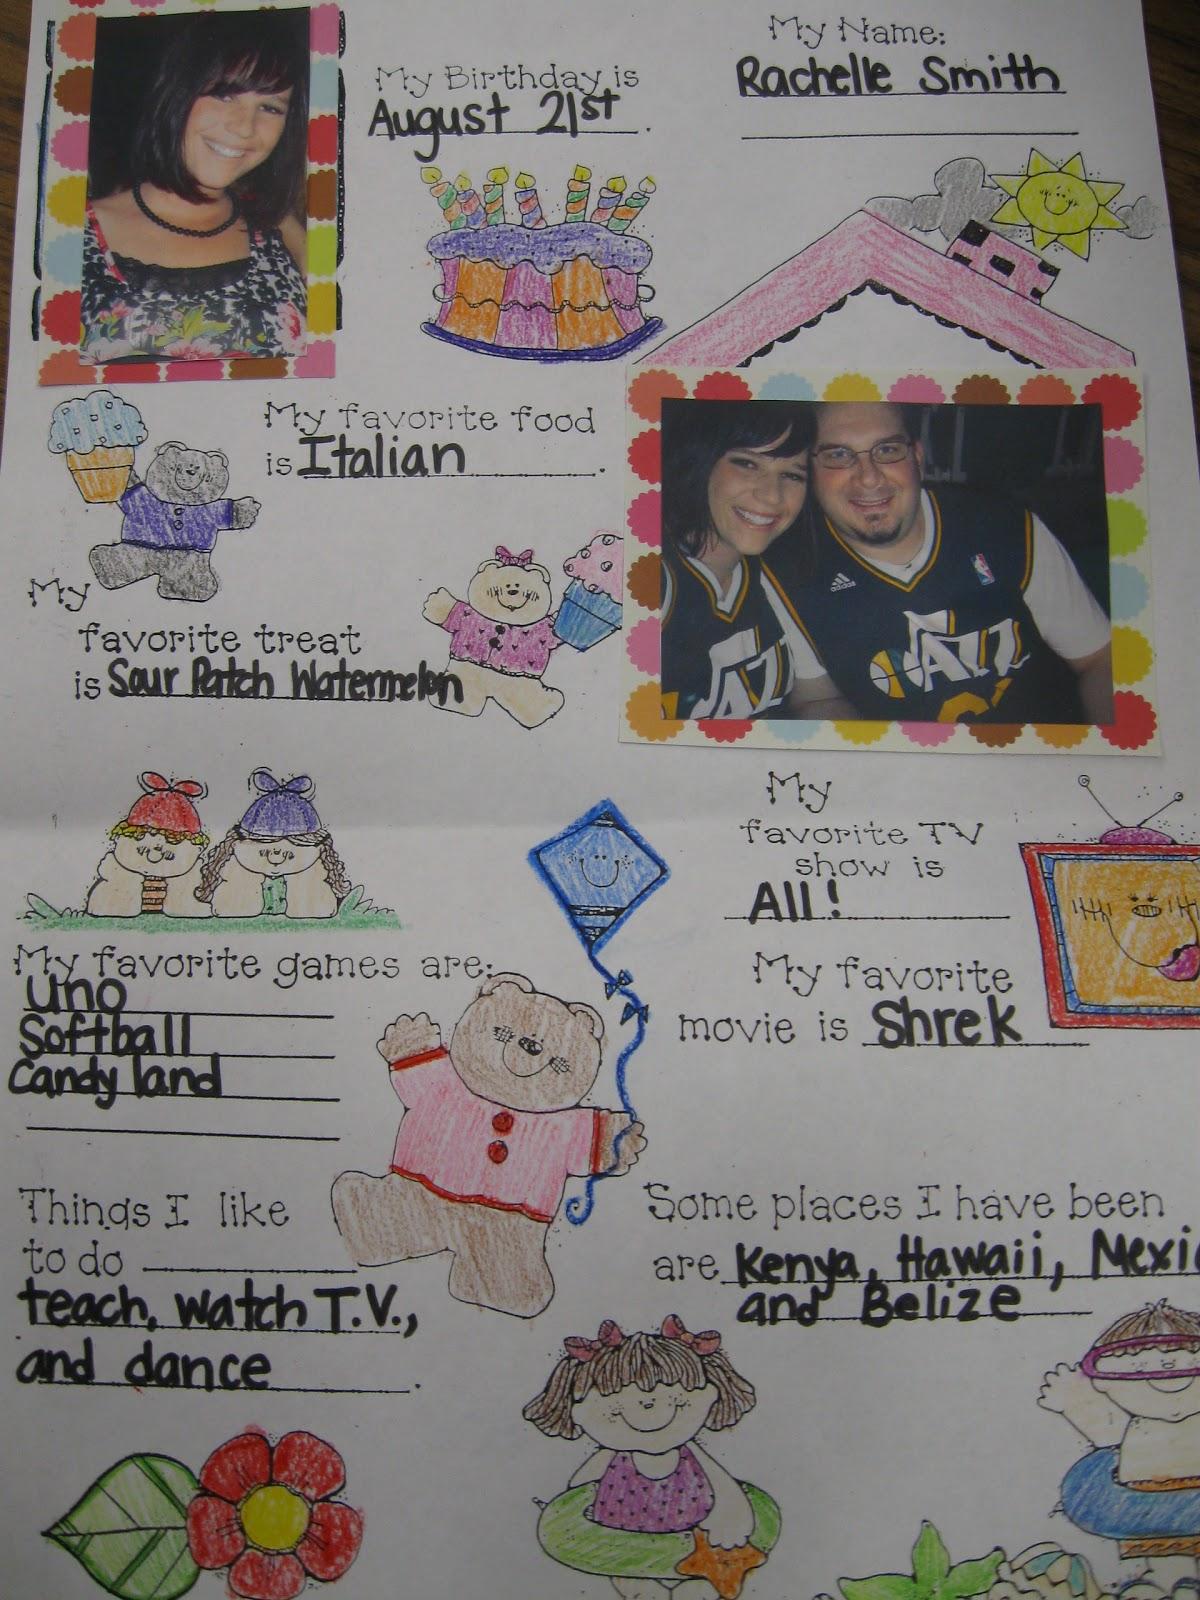 What The Teacher Wants Star Student January 2011 Archives Situs Agen Sbobet Bandar Ibcbet Taruhan Judi Im Always Vip First